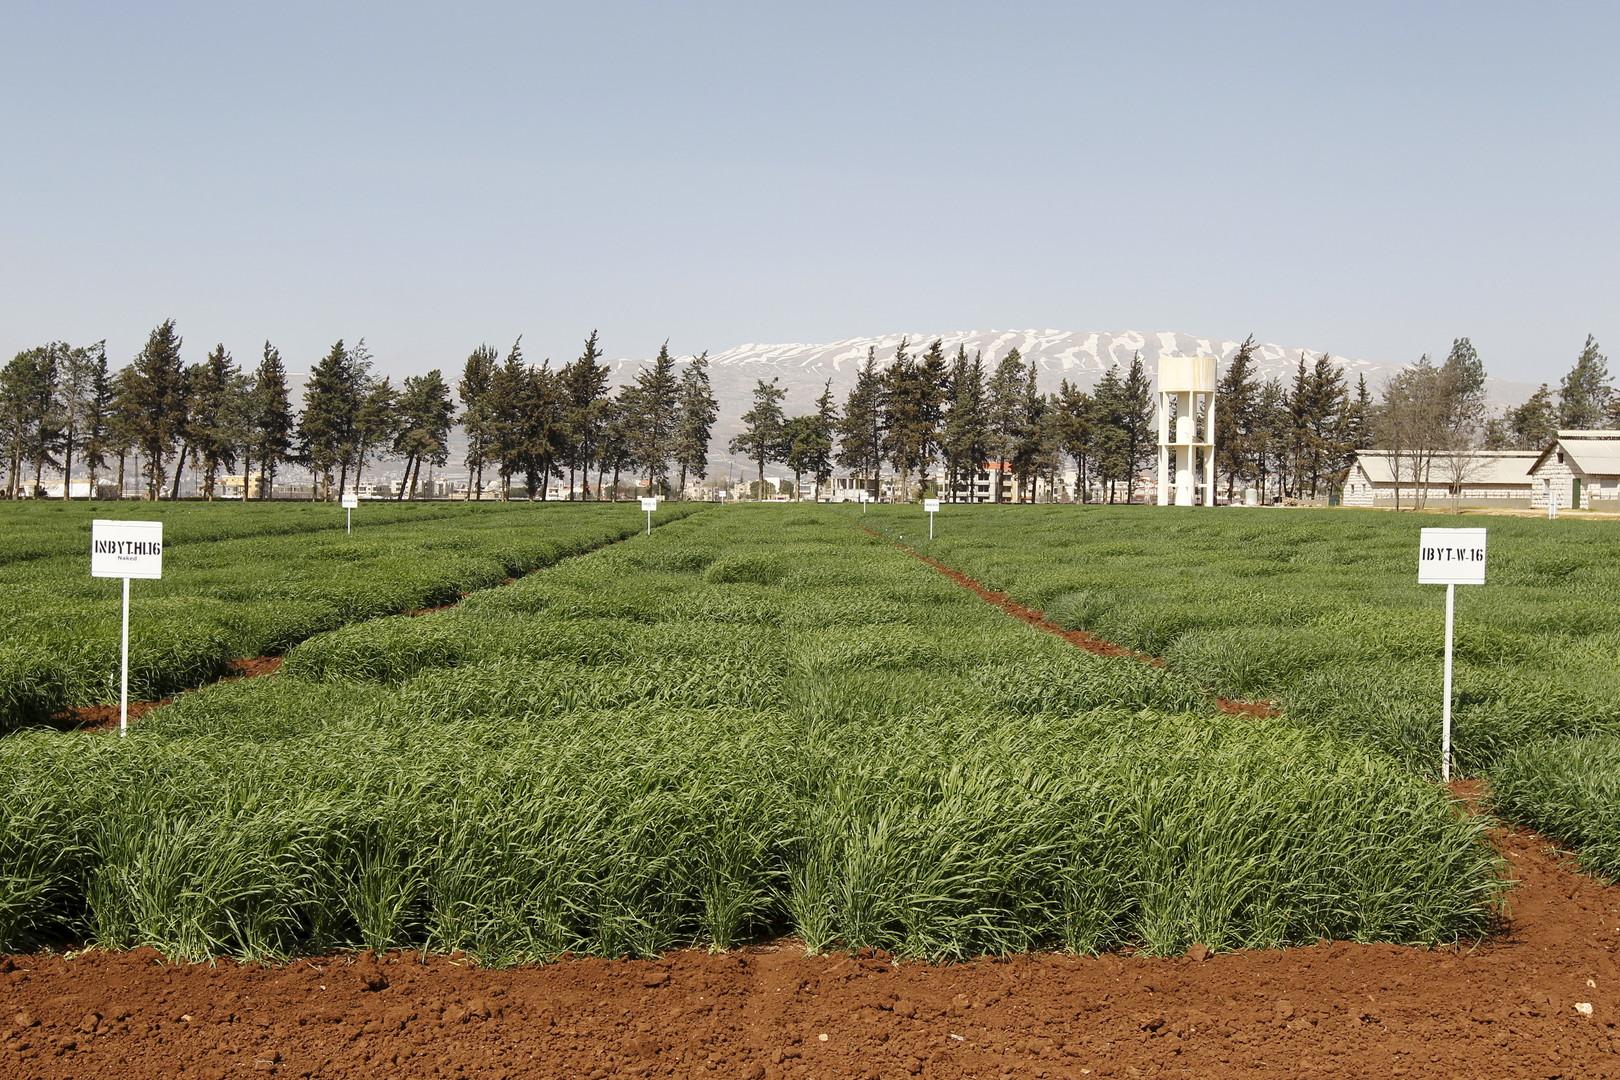 غزو الحشرات يصل دمشق وريفها .. و